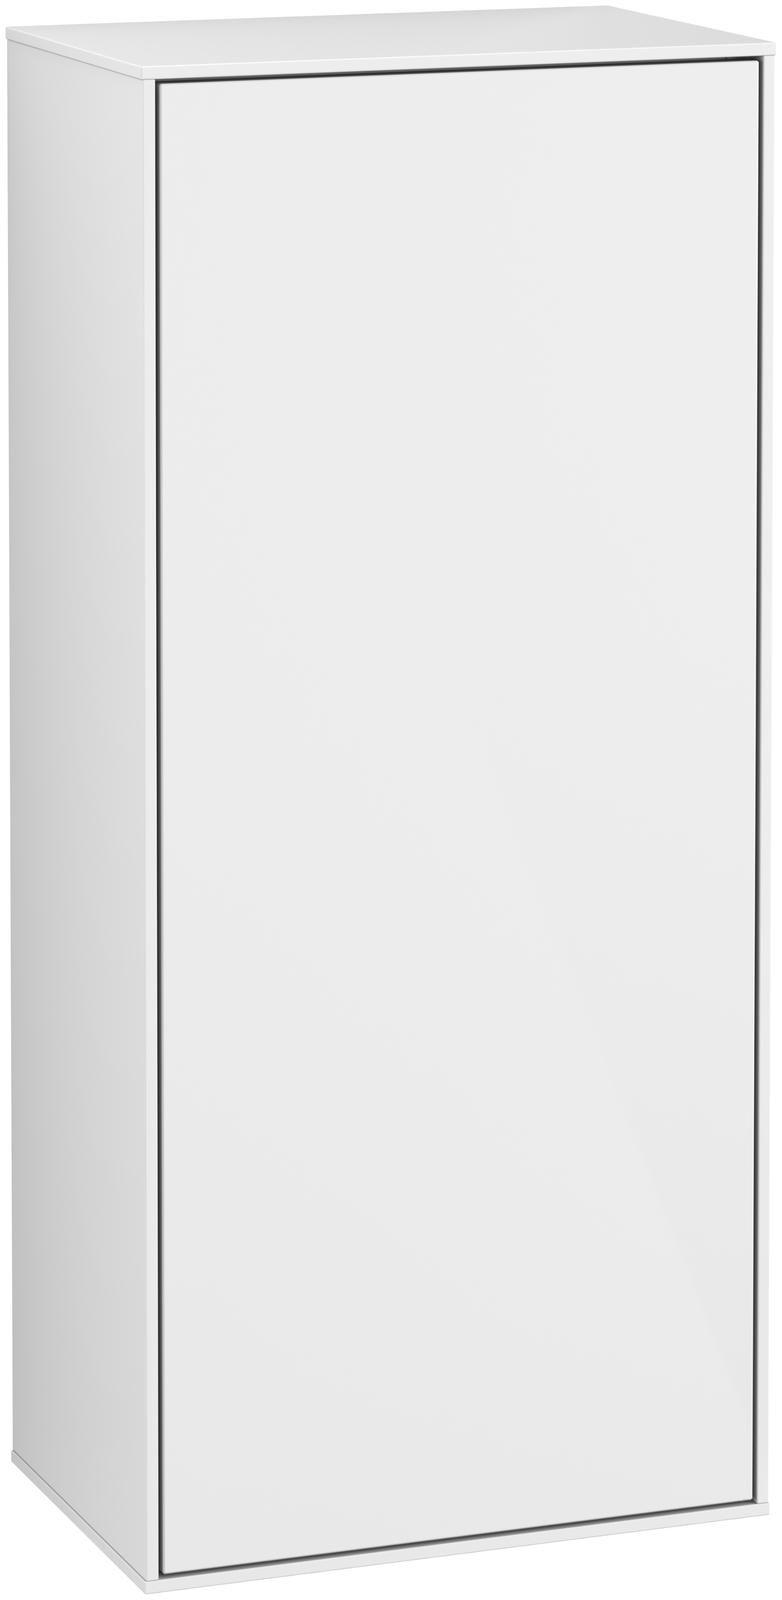 Villeroy & Boch Finion G57 Seitenschrank 1 Tür Anschlag rechts LED-Beleuchtung B:41,8xH:93,6xT:27cm Front, Korpus: Glossy White Lack G57000GF